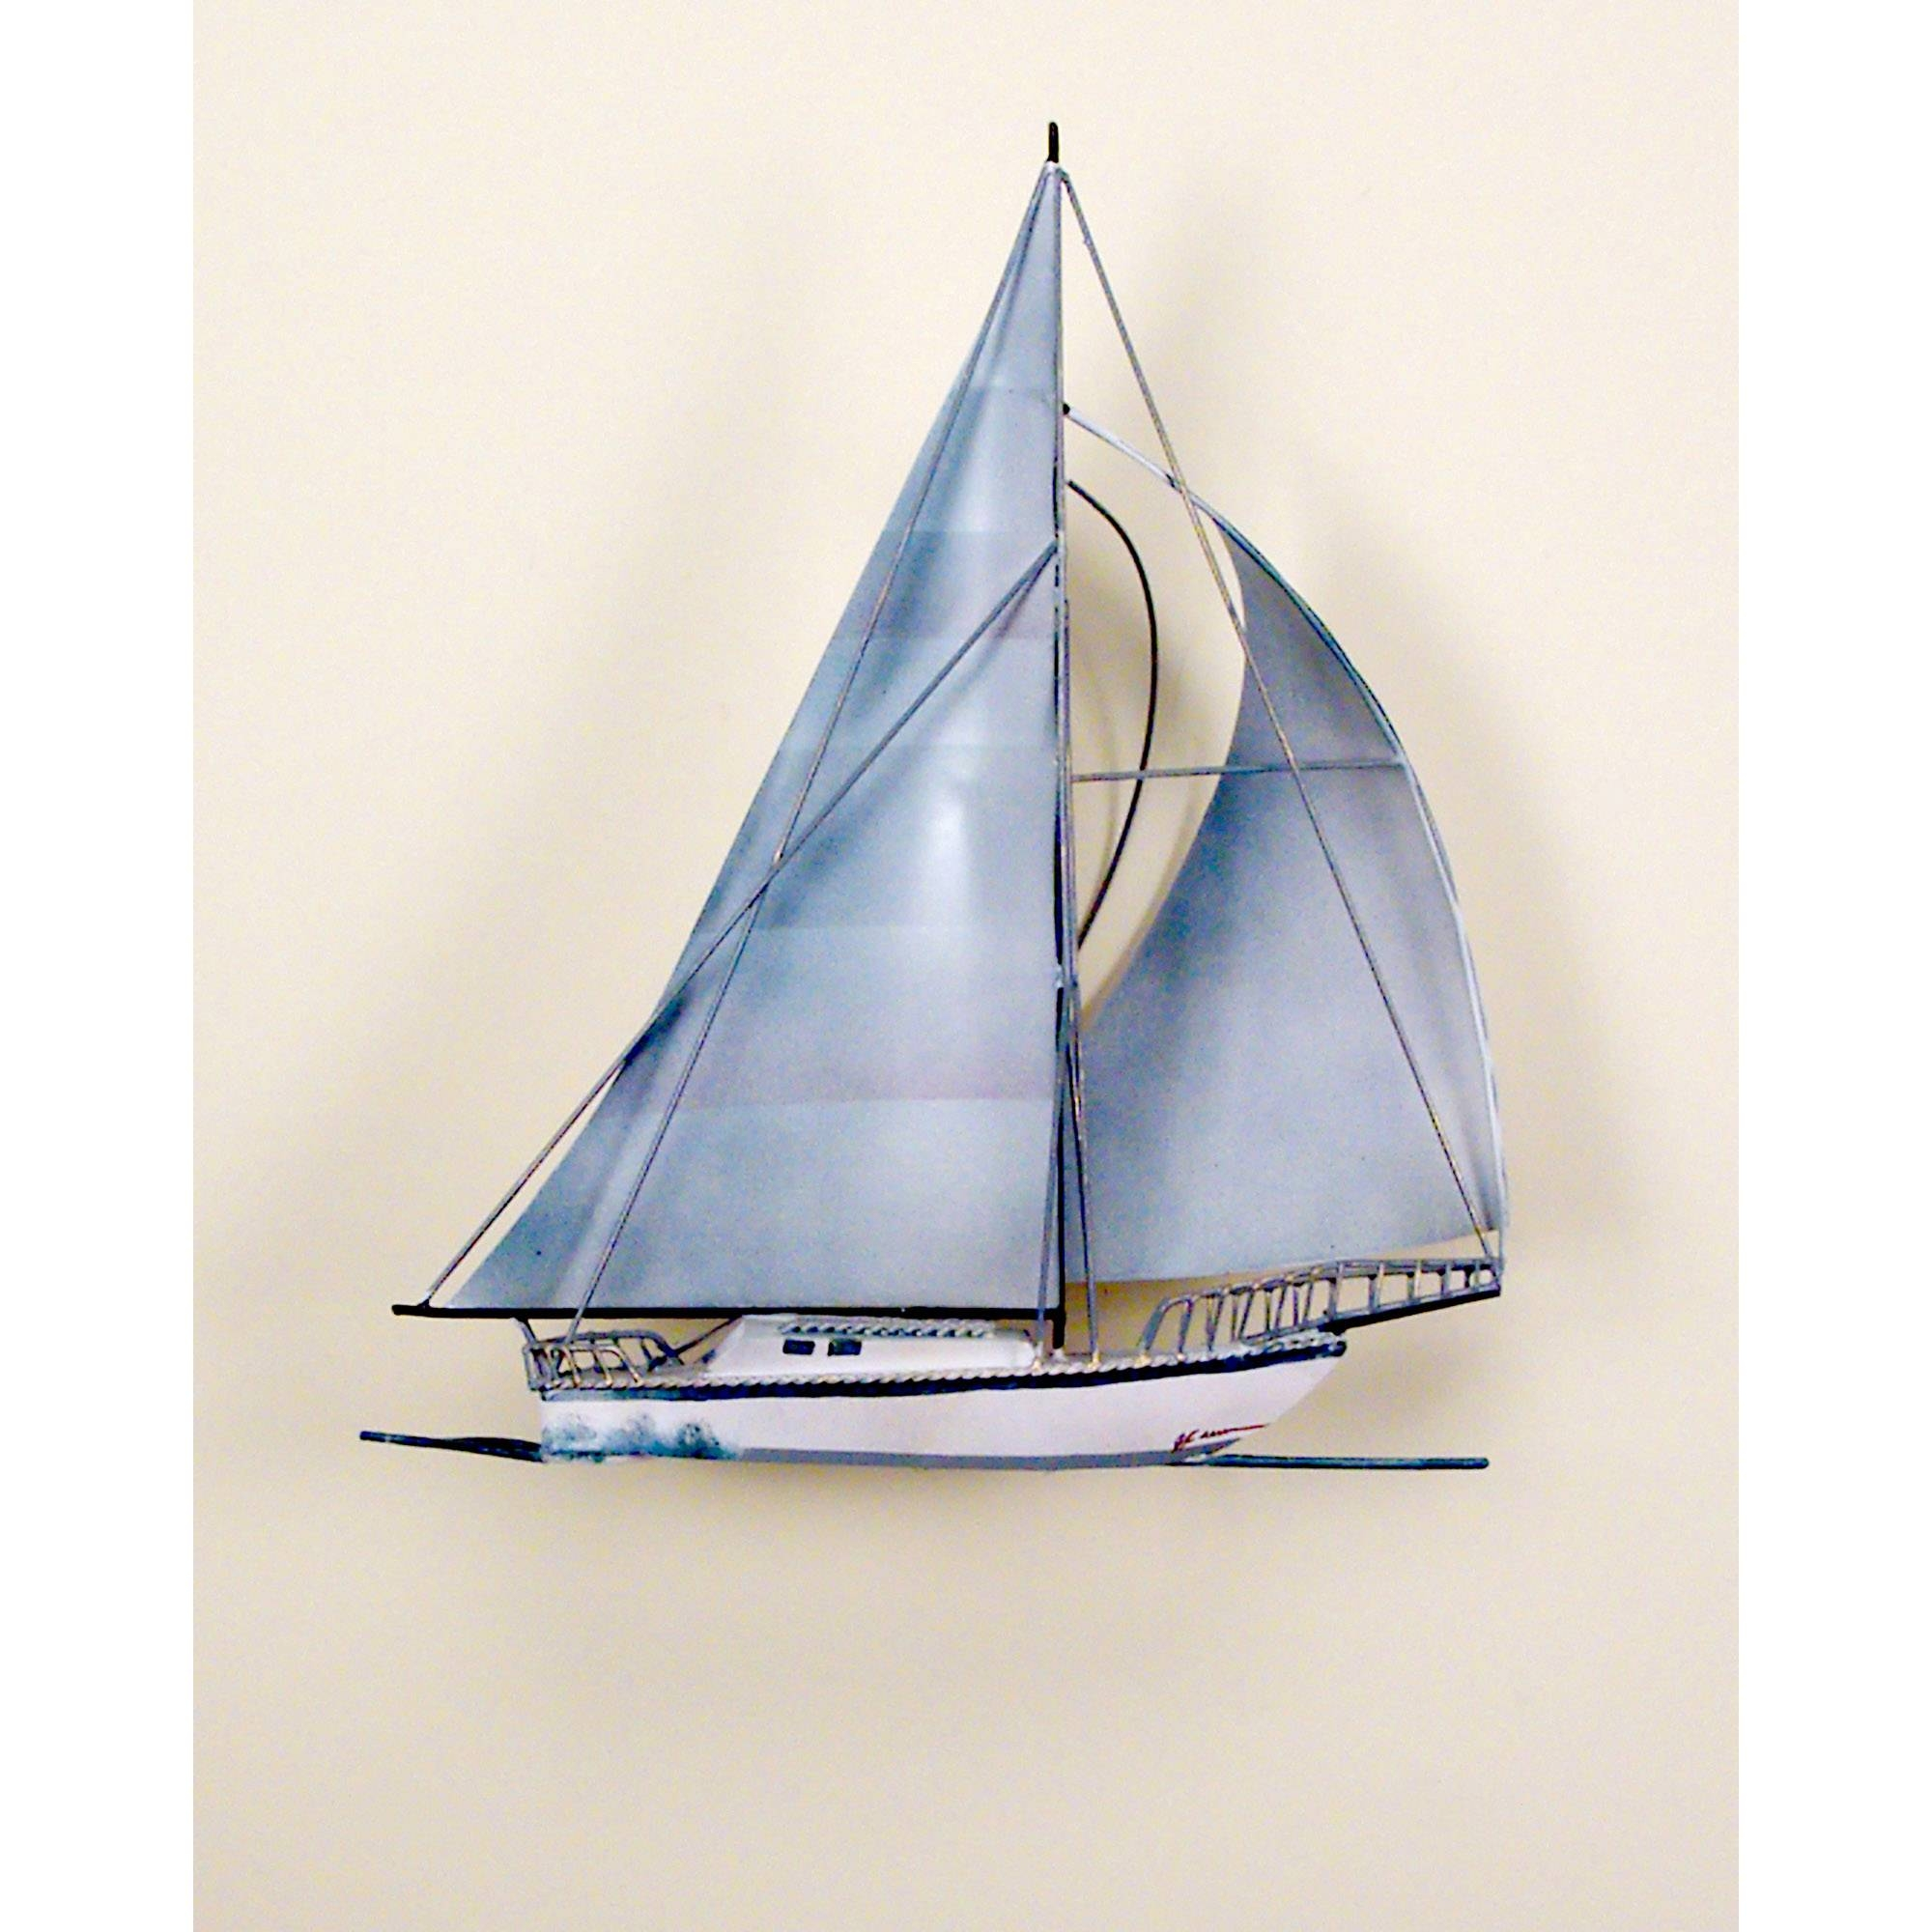 Windjamer Sailboat, Single, Ocean, Boat, Nautical, Sailing With Regard To 2017 Metal Sailboat Wall Art (View 4 of 30)